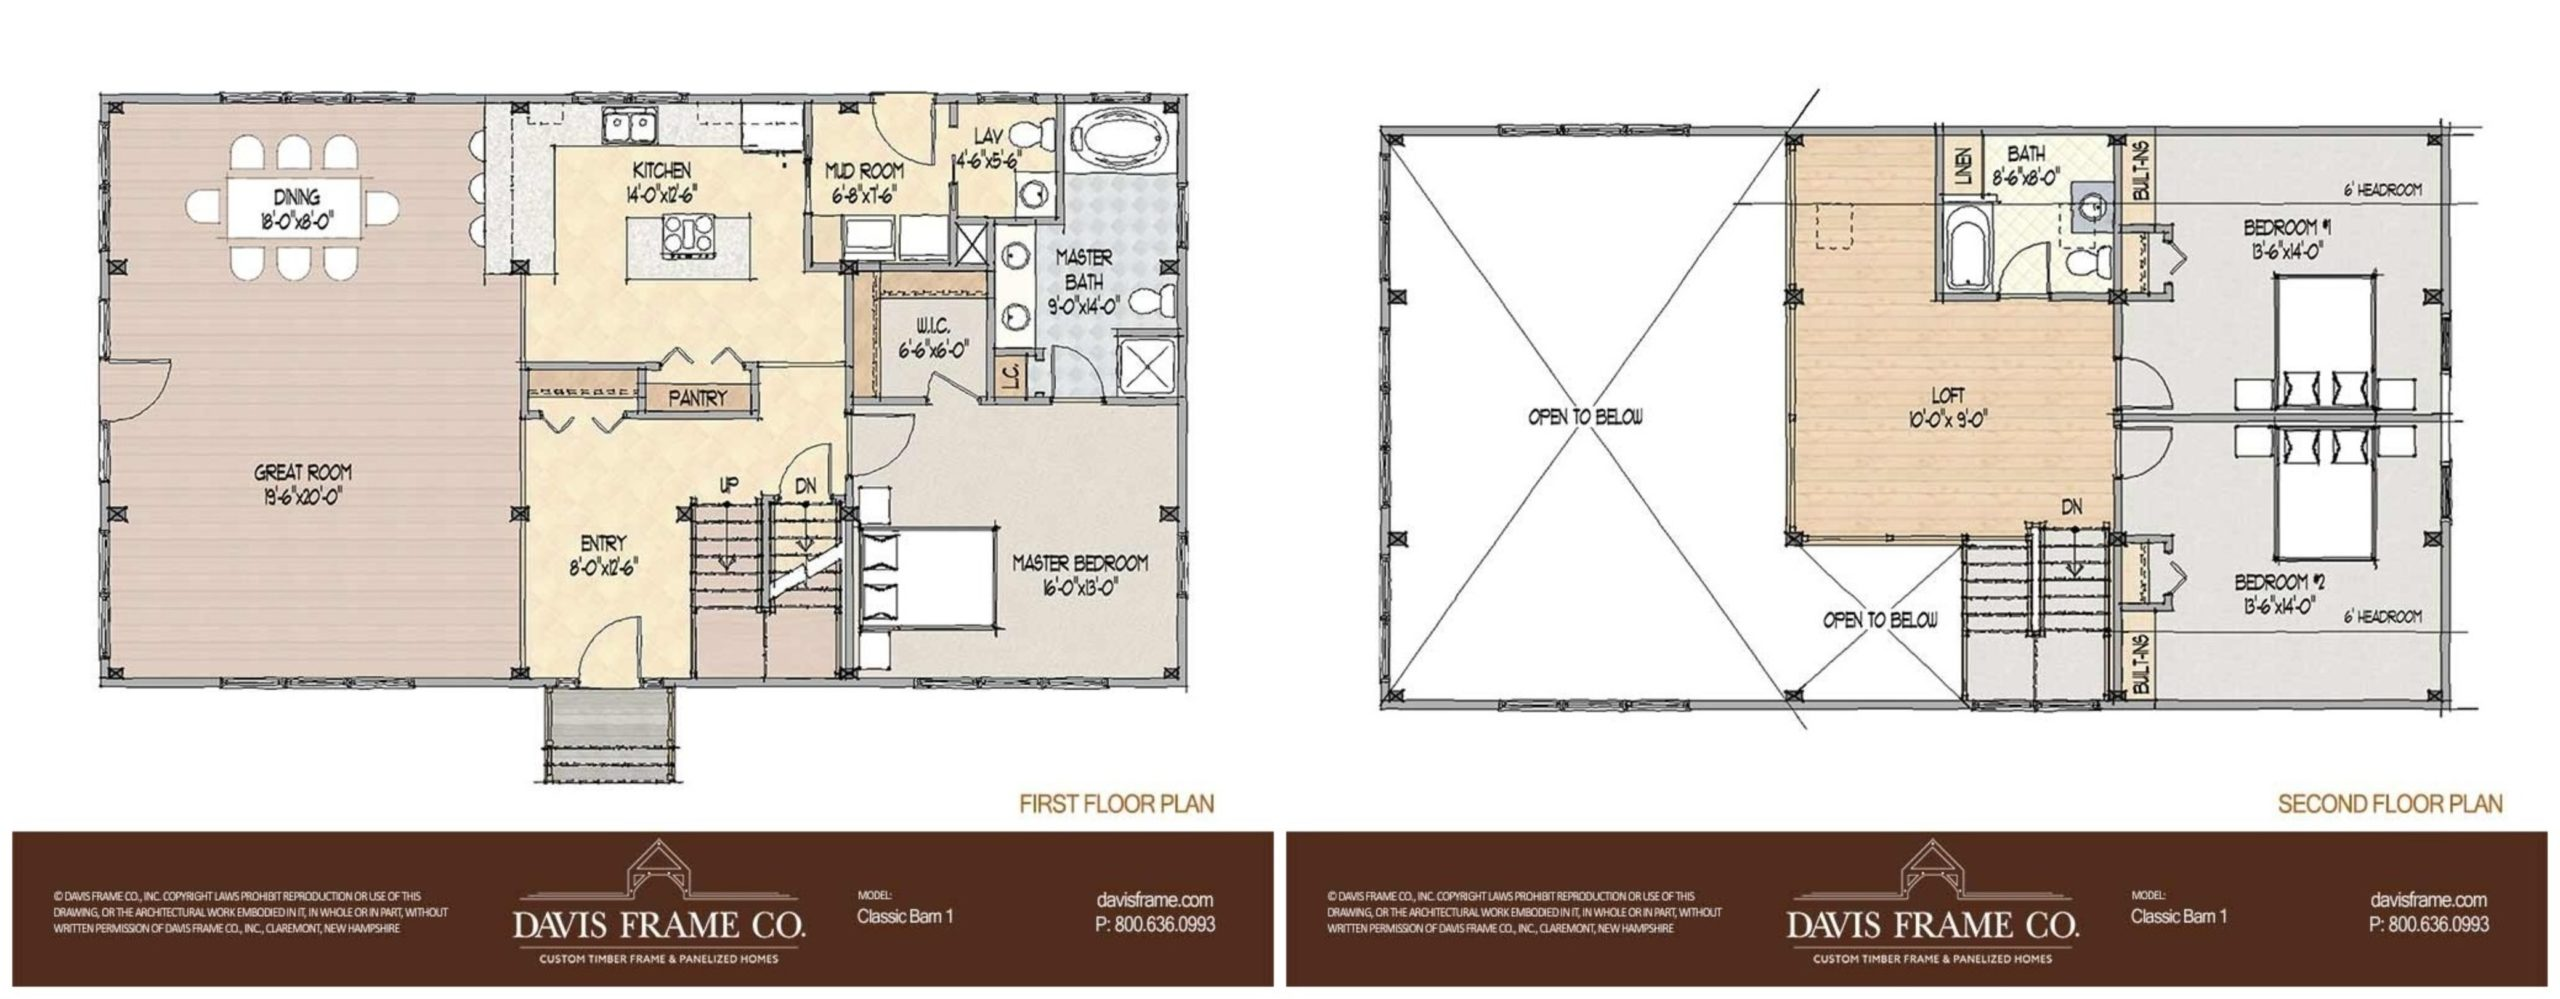 classic barn home 1 floor plan